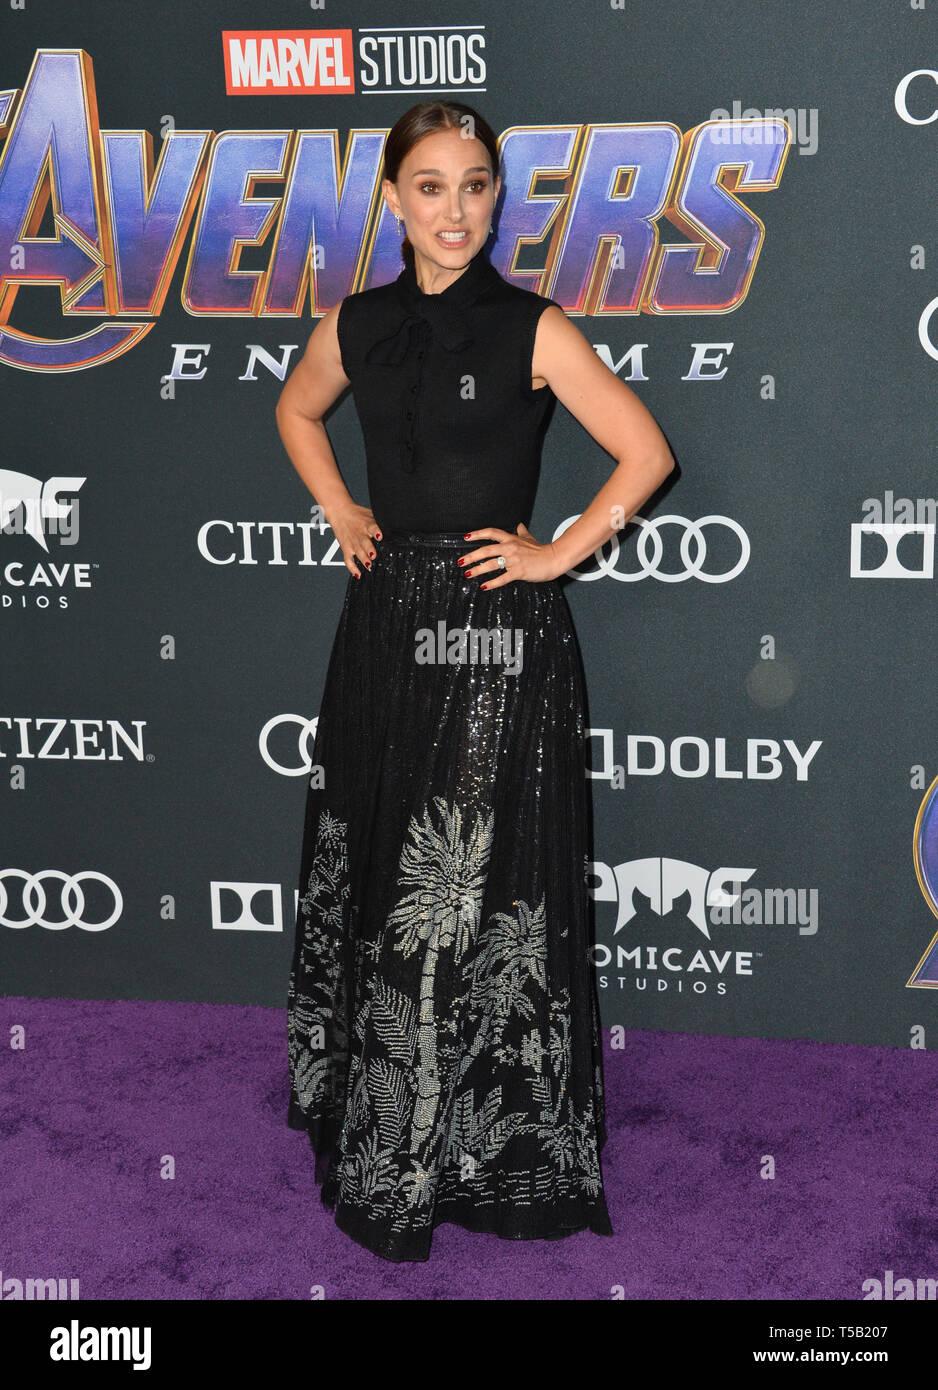 "Los Angeles, USA. 22nd Apr, 2019. LOS ANGELES, USA. April 22, 2019: Natalie Portman at the world premiere of Marvel Studios' ""Avengers: Endgame"". Credit: Paul Smith/Alamy Live News Stock Photo"